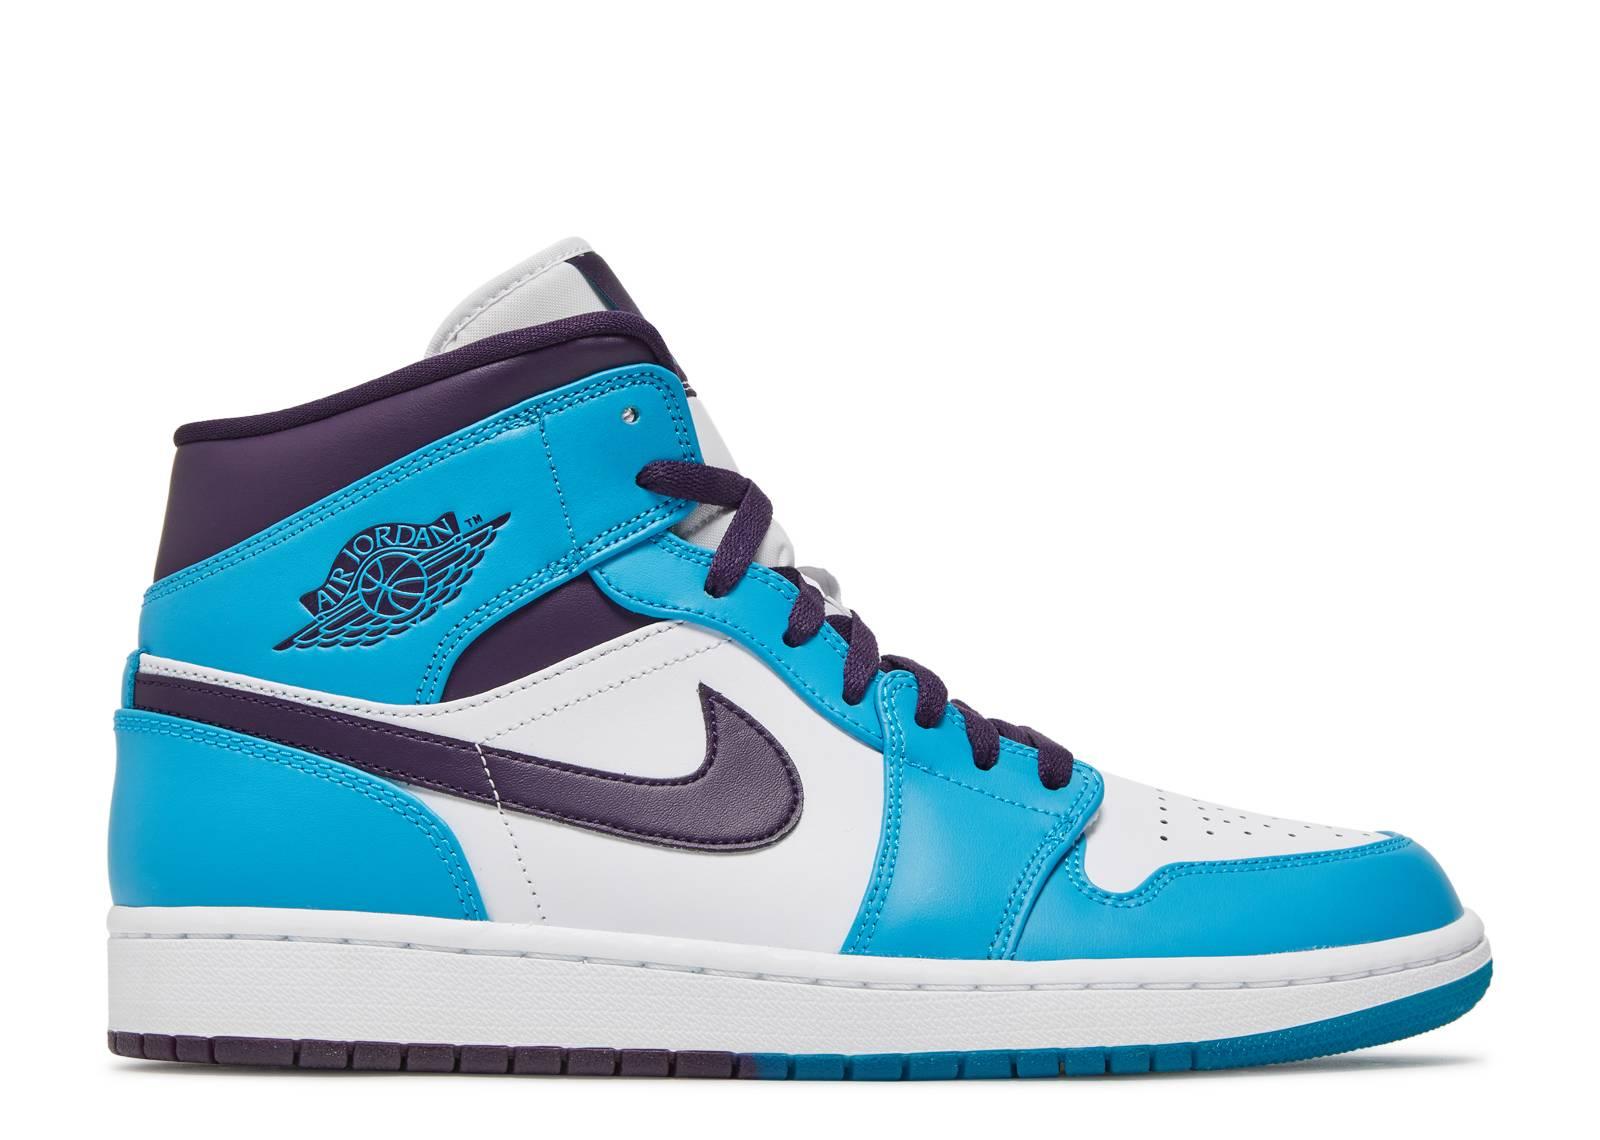 03078576b717 Air Jordan 1 Mid - Air Jordan - 554724 415 - blue lagoon grand purple-white